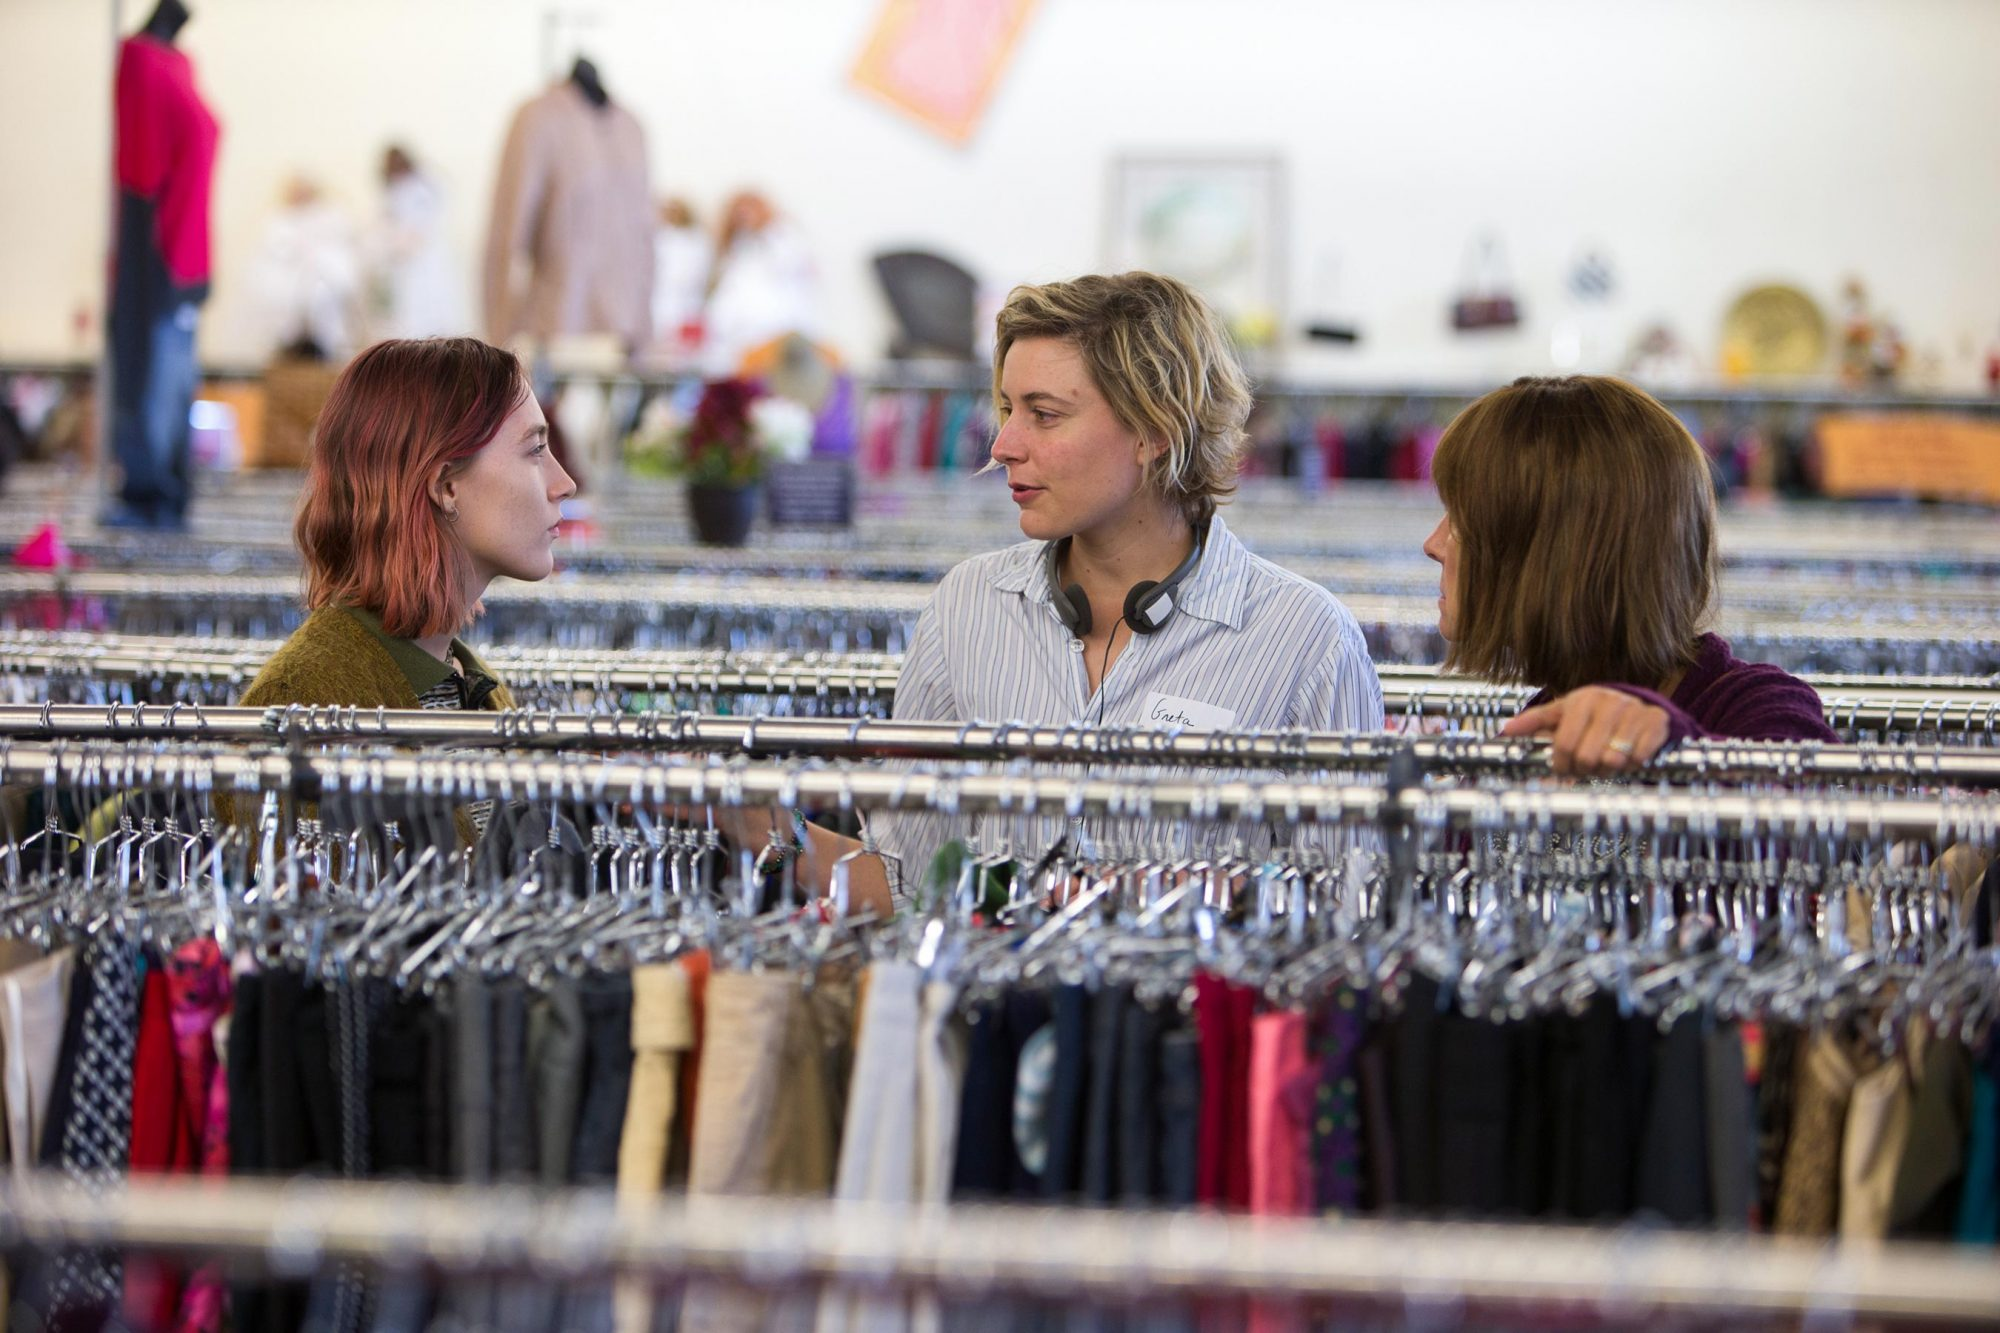 Lady BirdBTSPictured: Saoirse Ronan,  Greta Gerwig, Laurie Metcalf